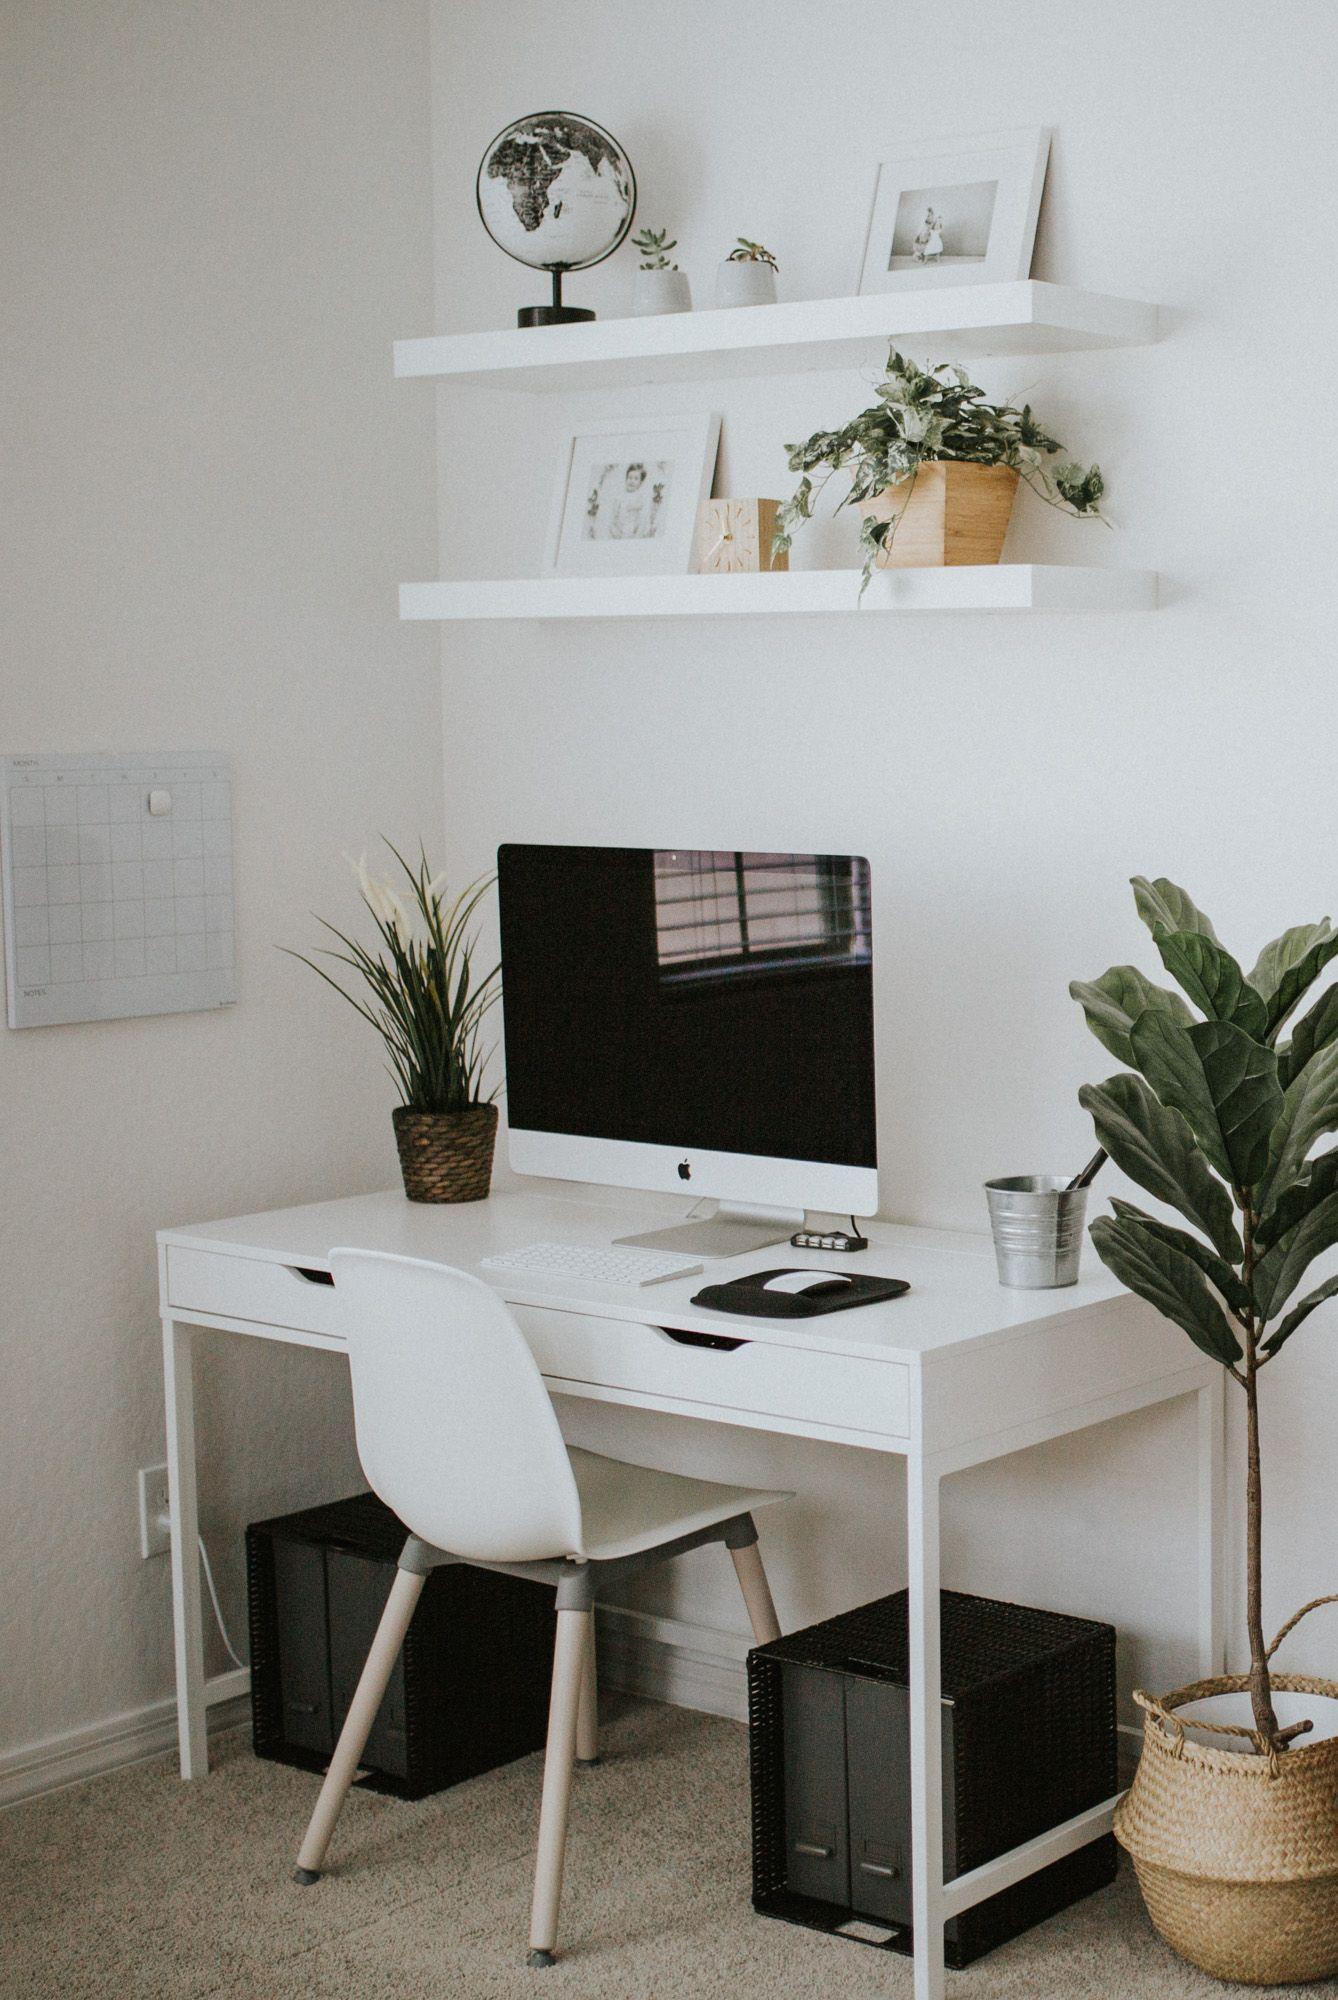 Home Office Ideas: Brilliant Hacks to Maximize Pro